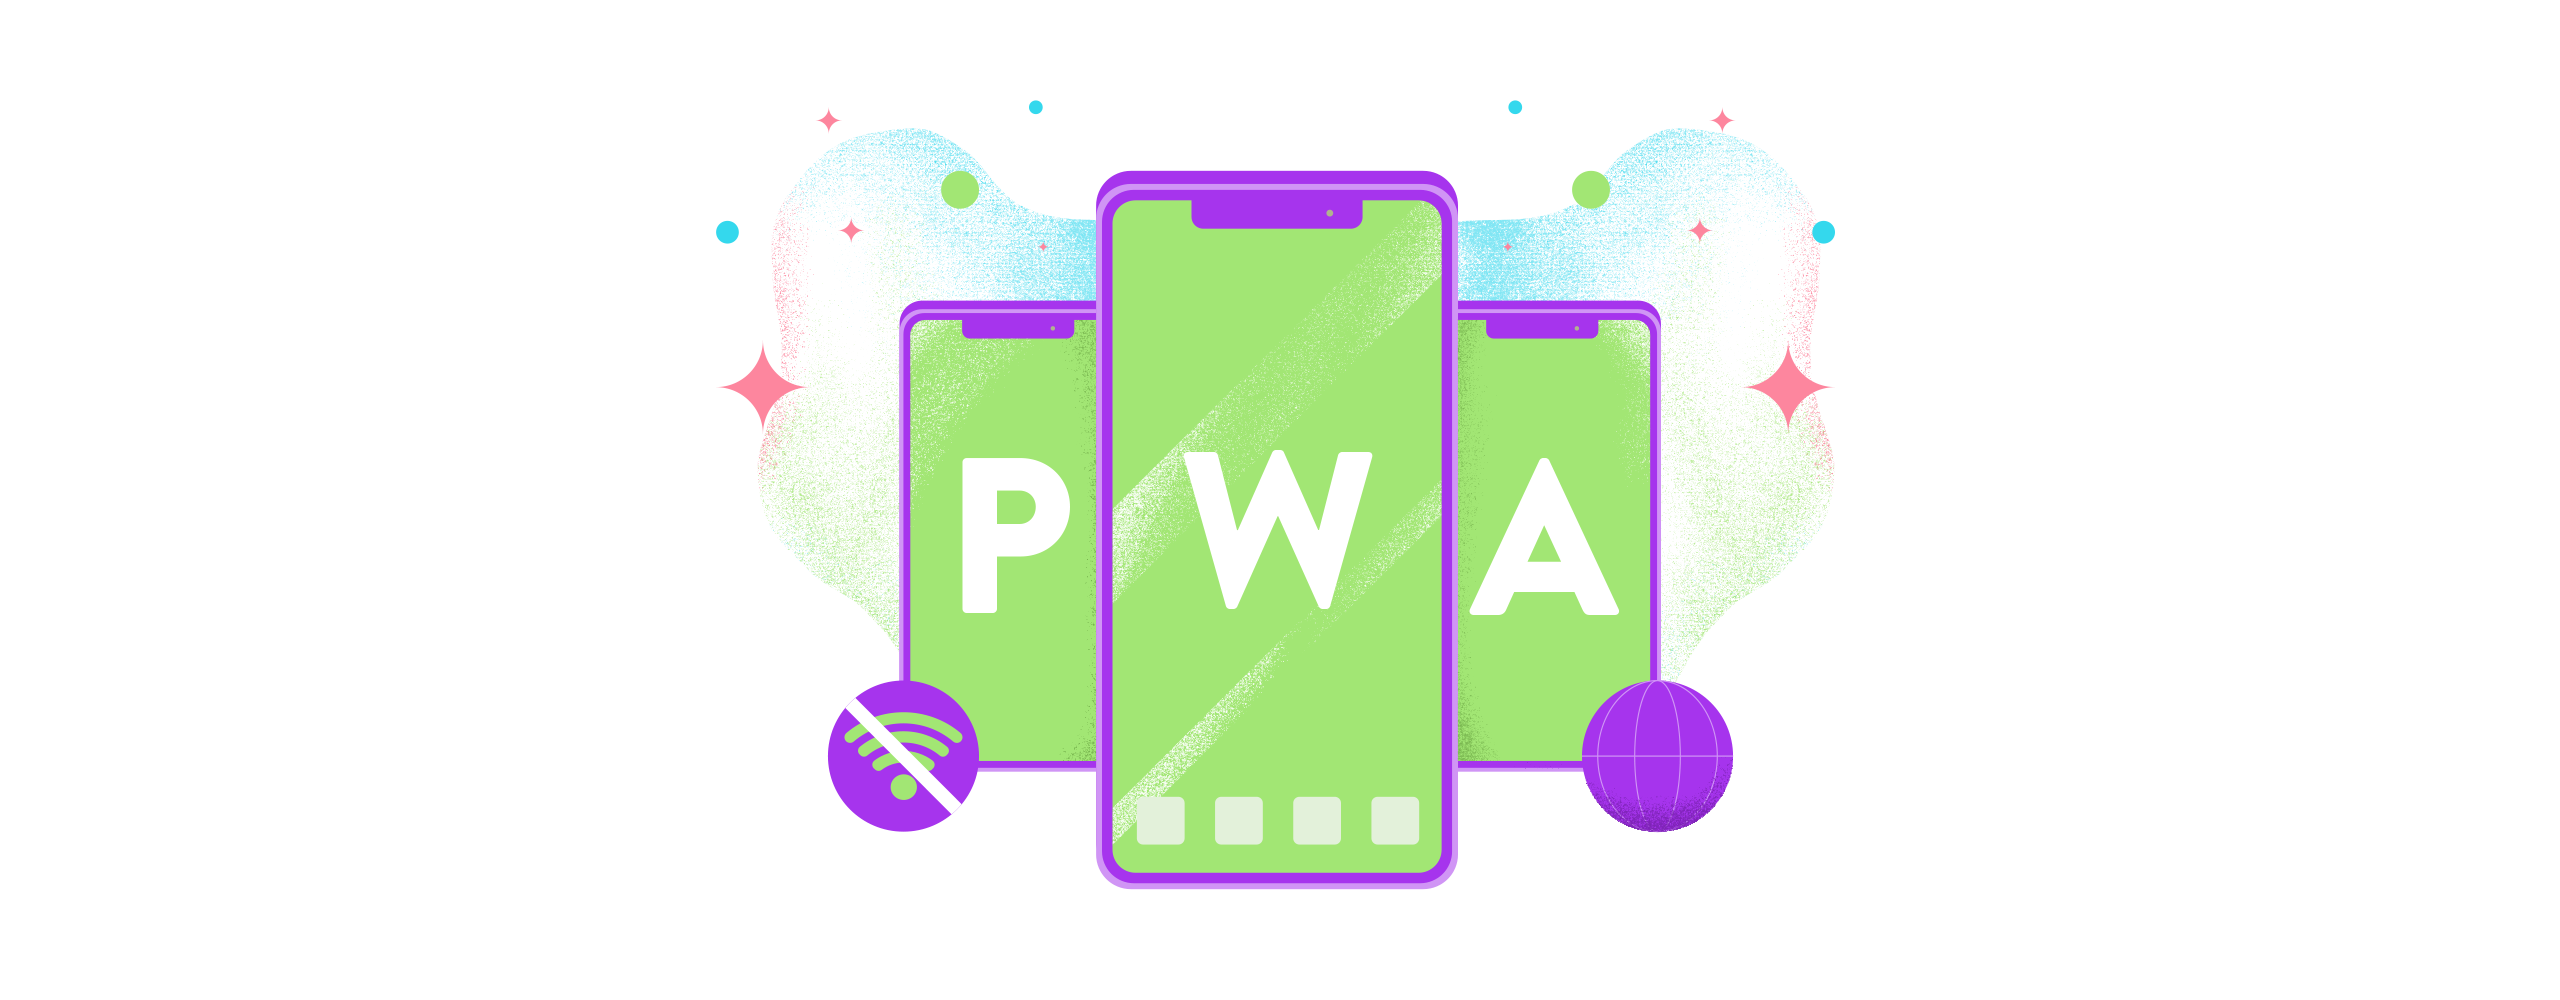 PWA for Apple